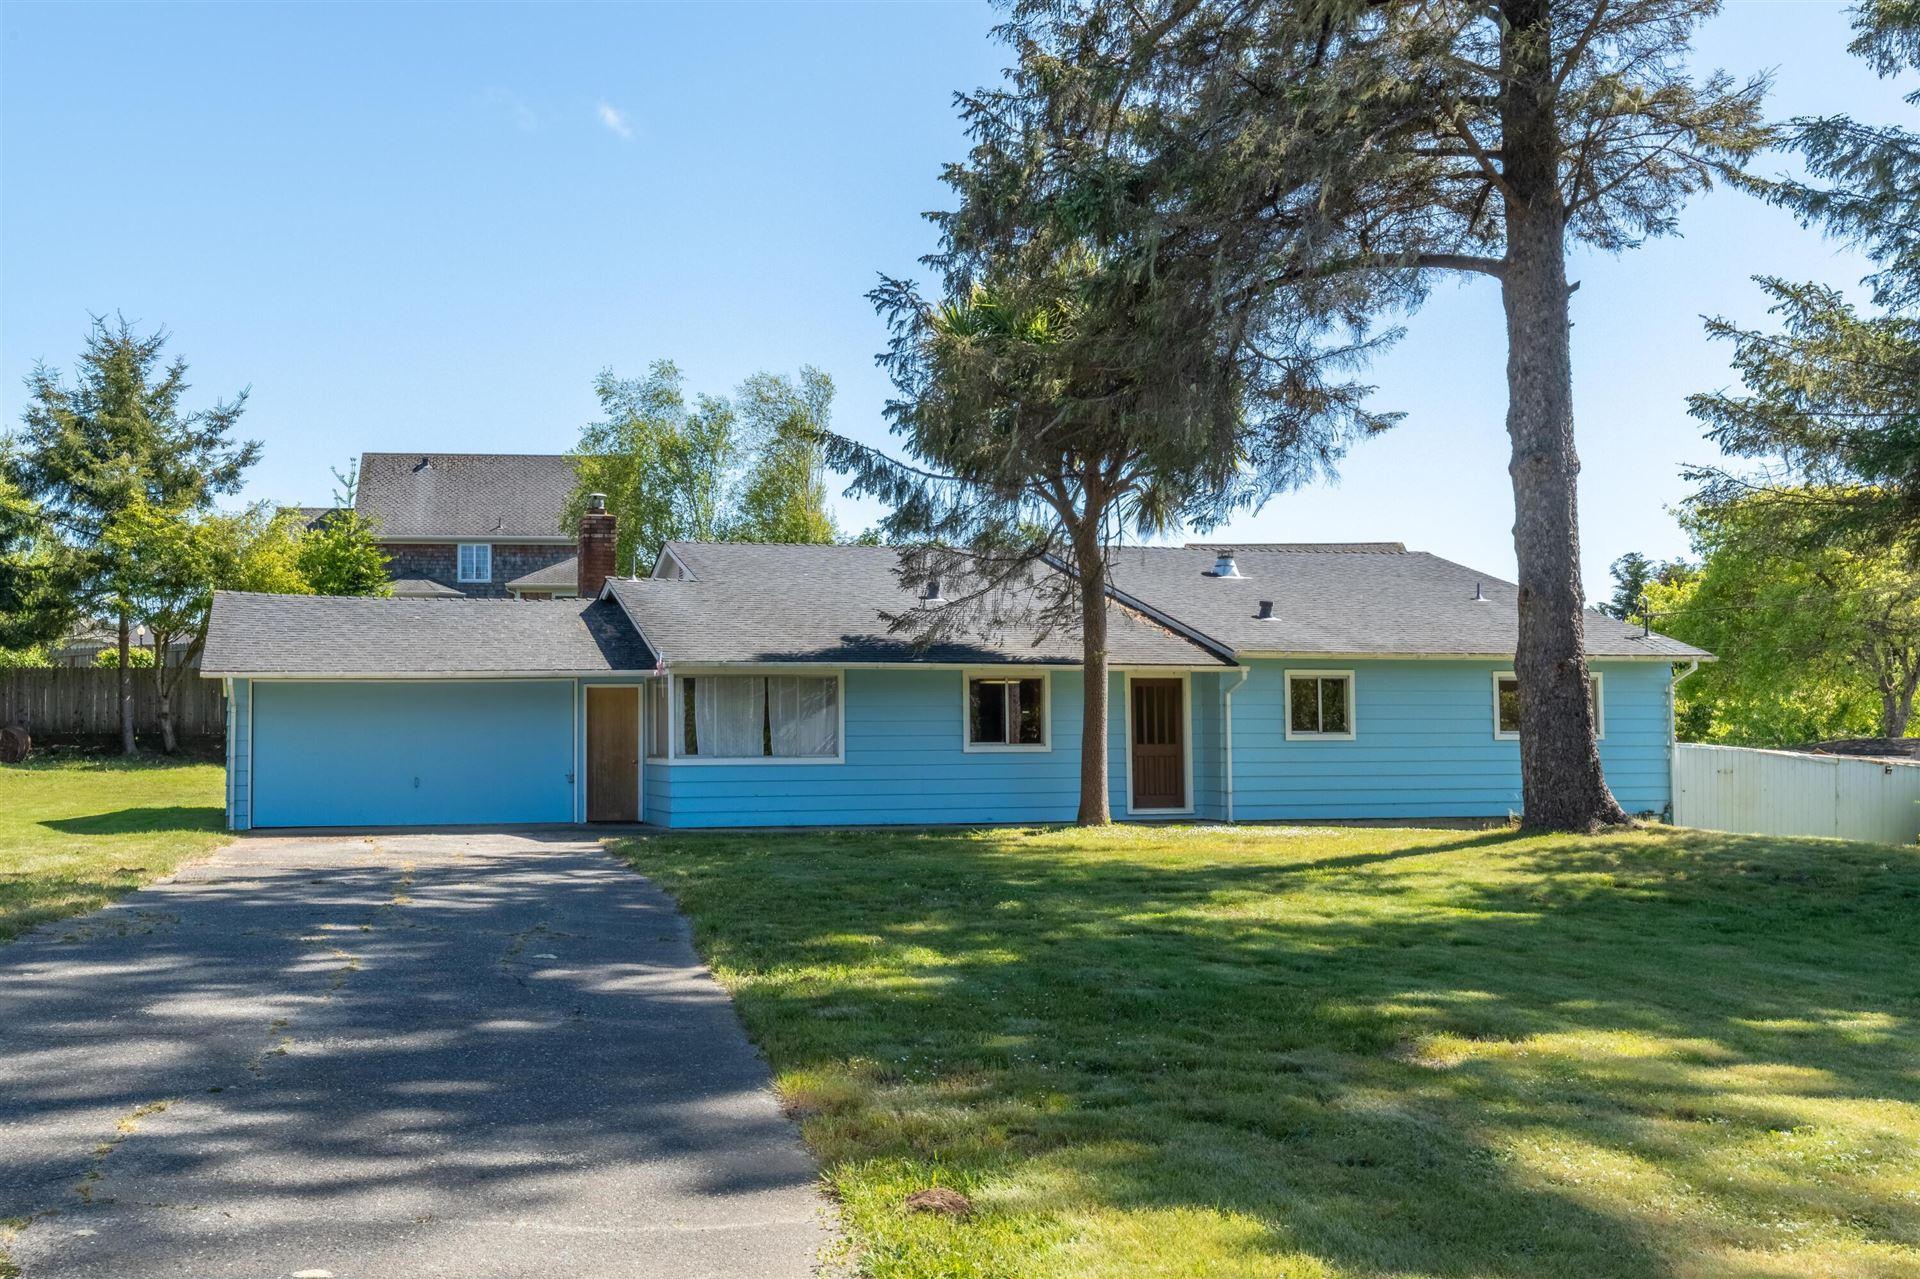 1734 Bella Vista Road, McKinleyville, CA 95519 - MLS#: 259136